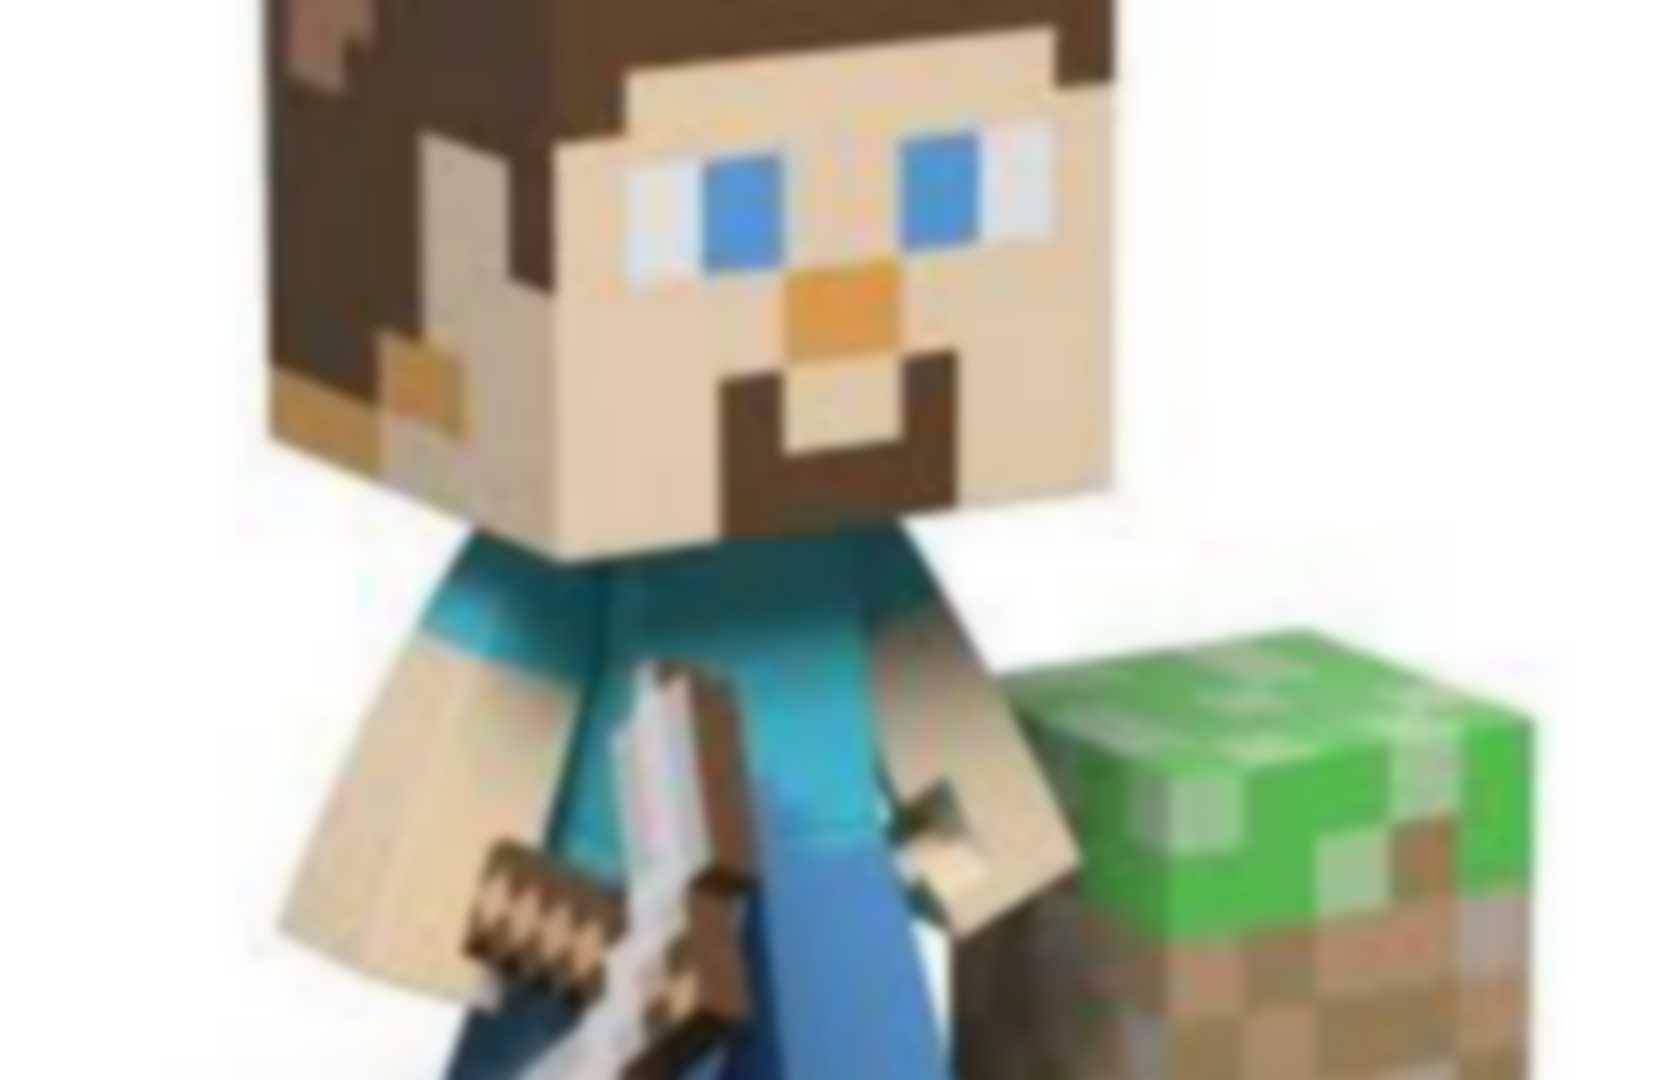 Logiciels Minecraft Architecte Pearltrees